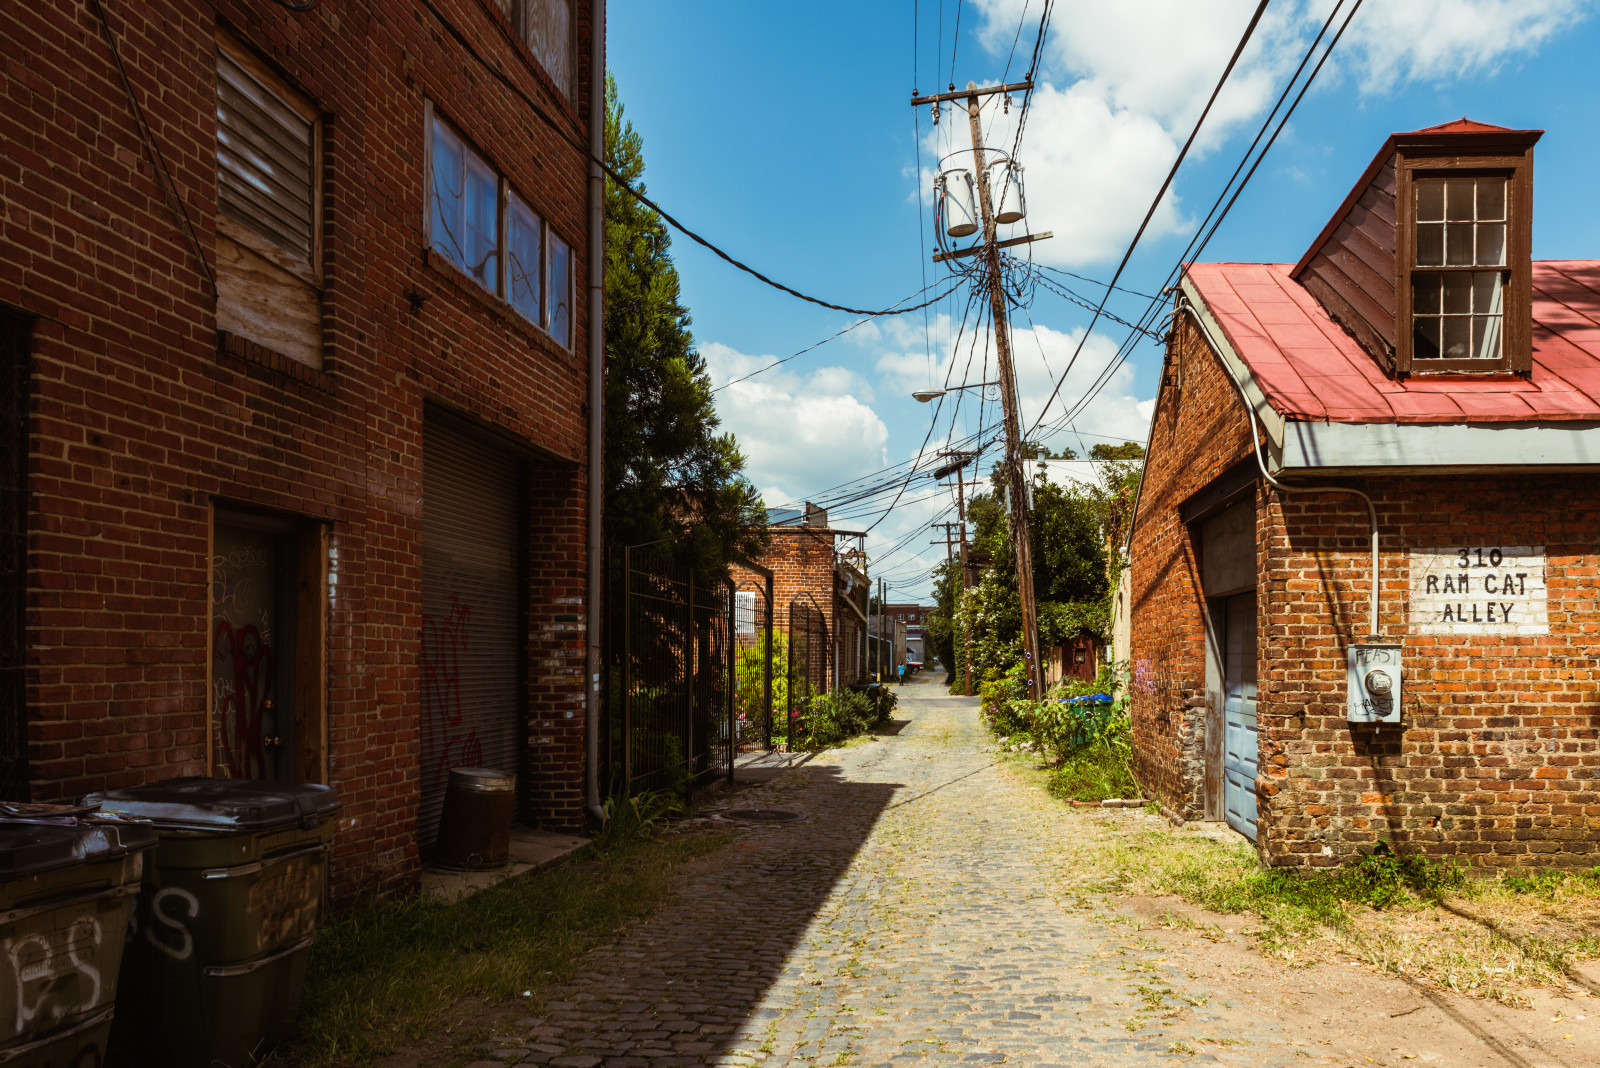 310 Ram Cat Alley